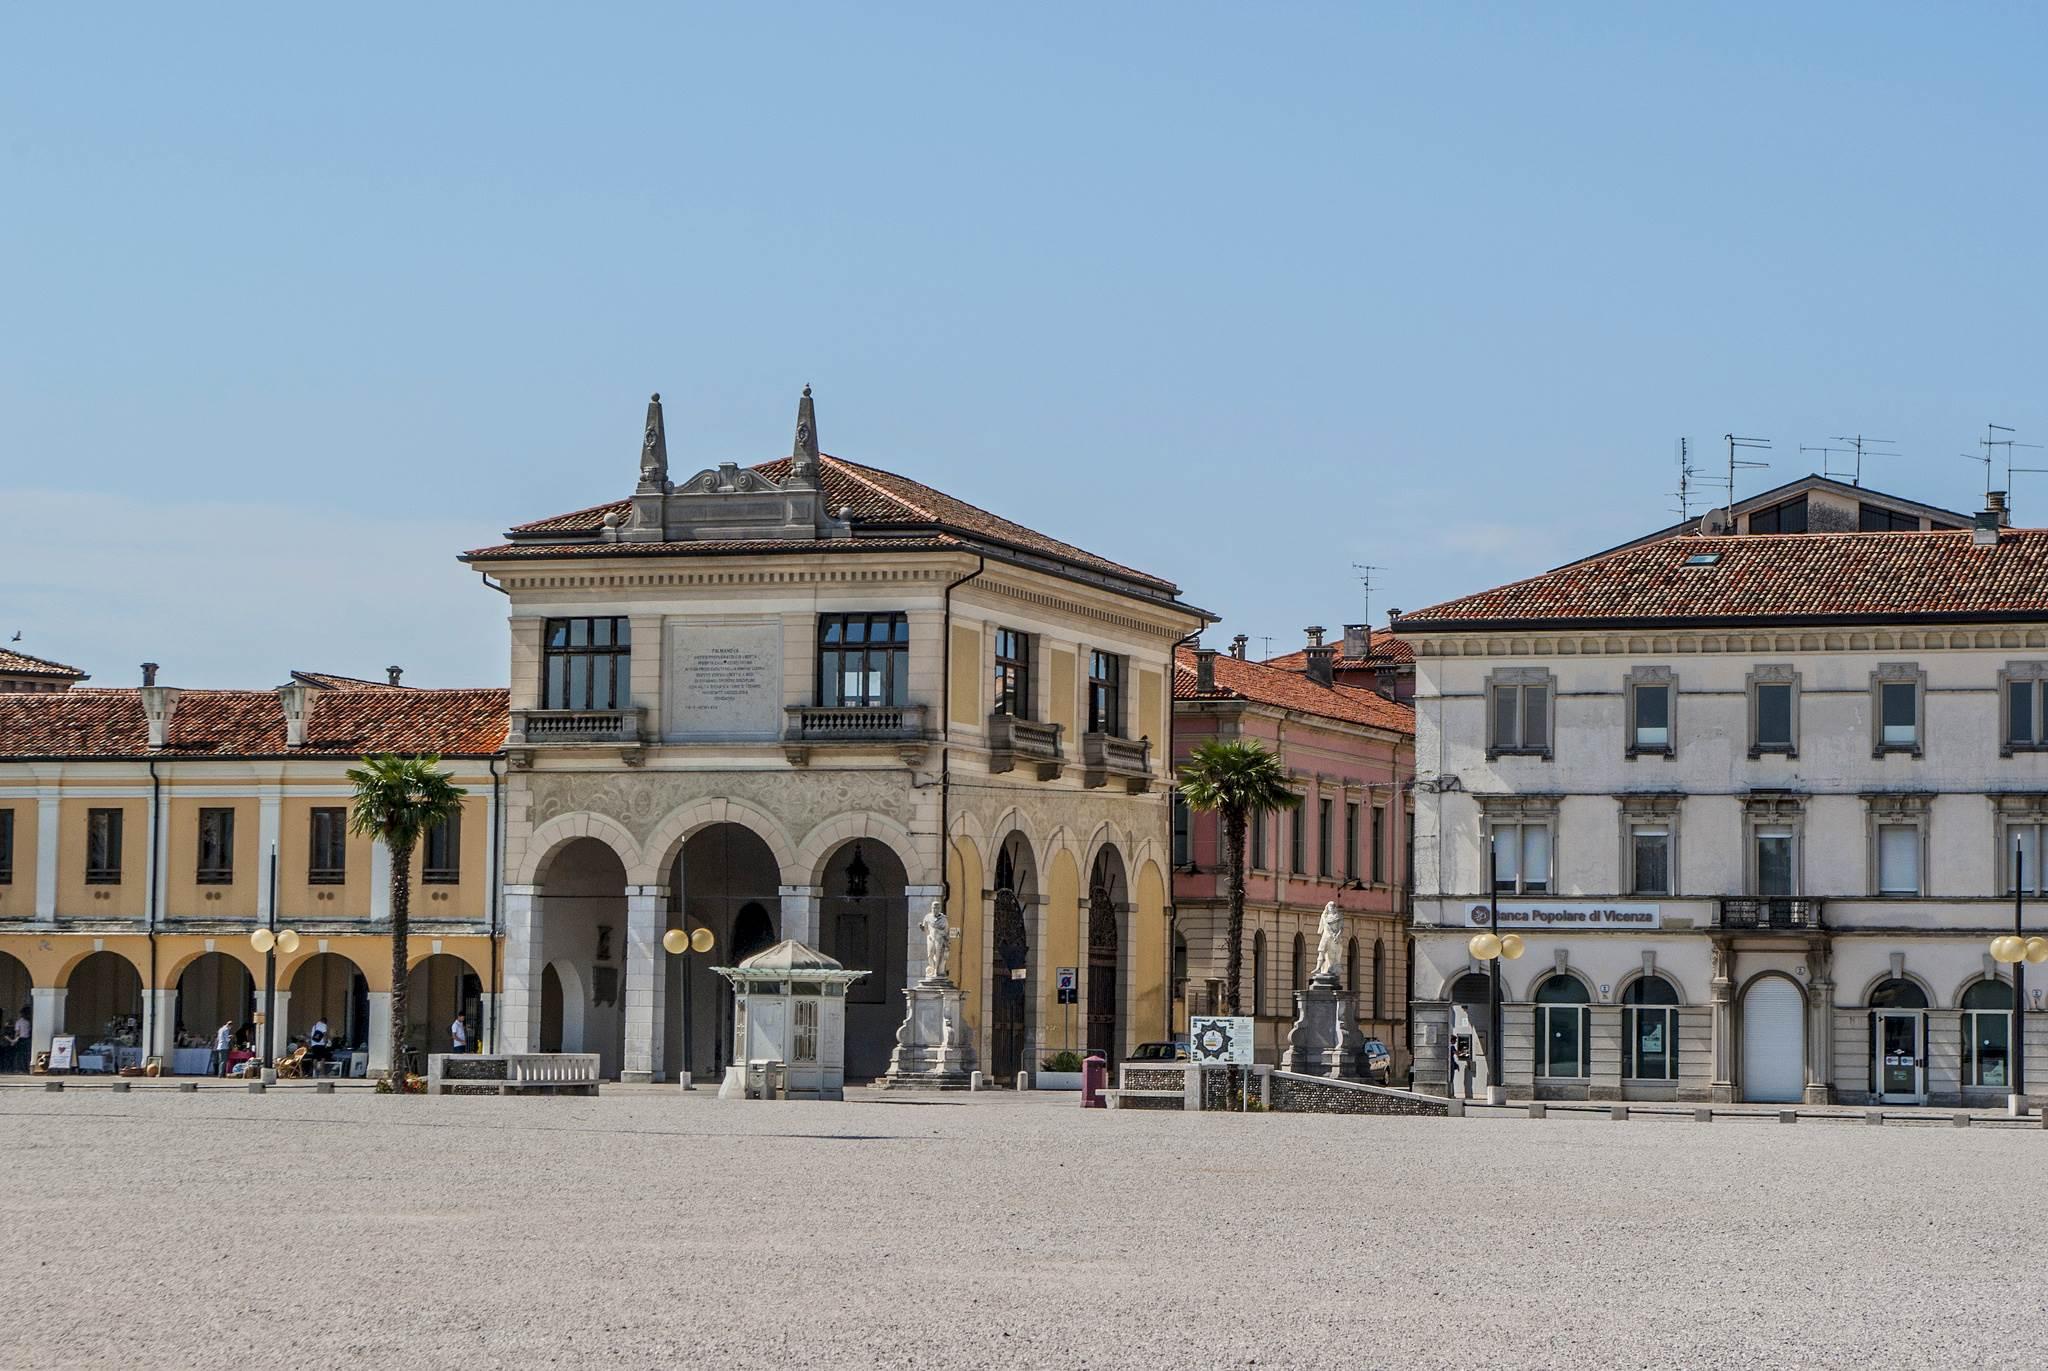 Piazza Grande Palmanova Włochy